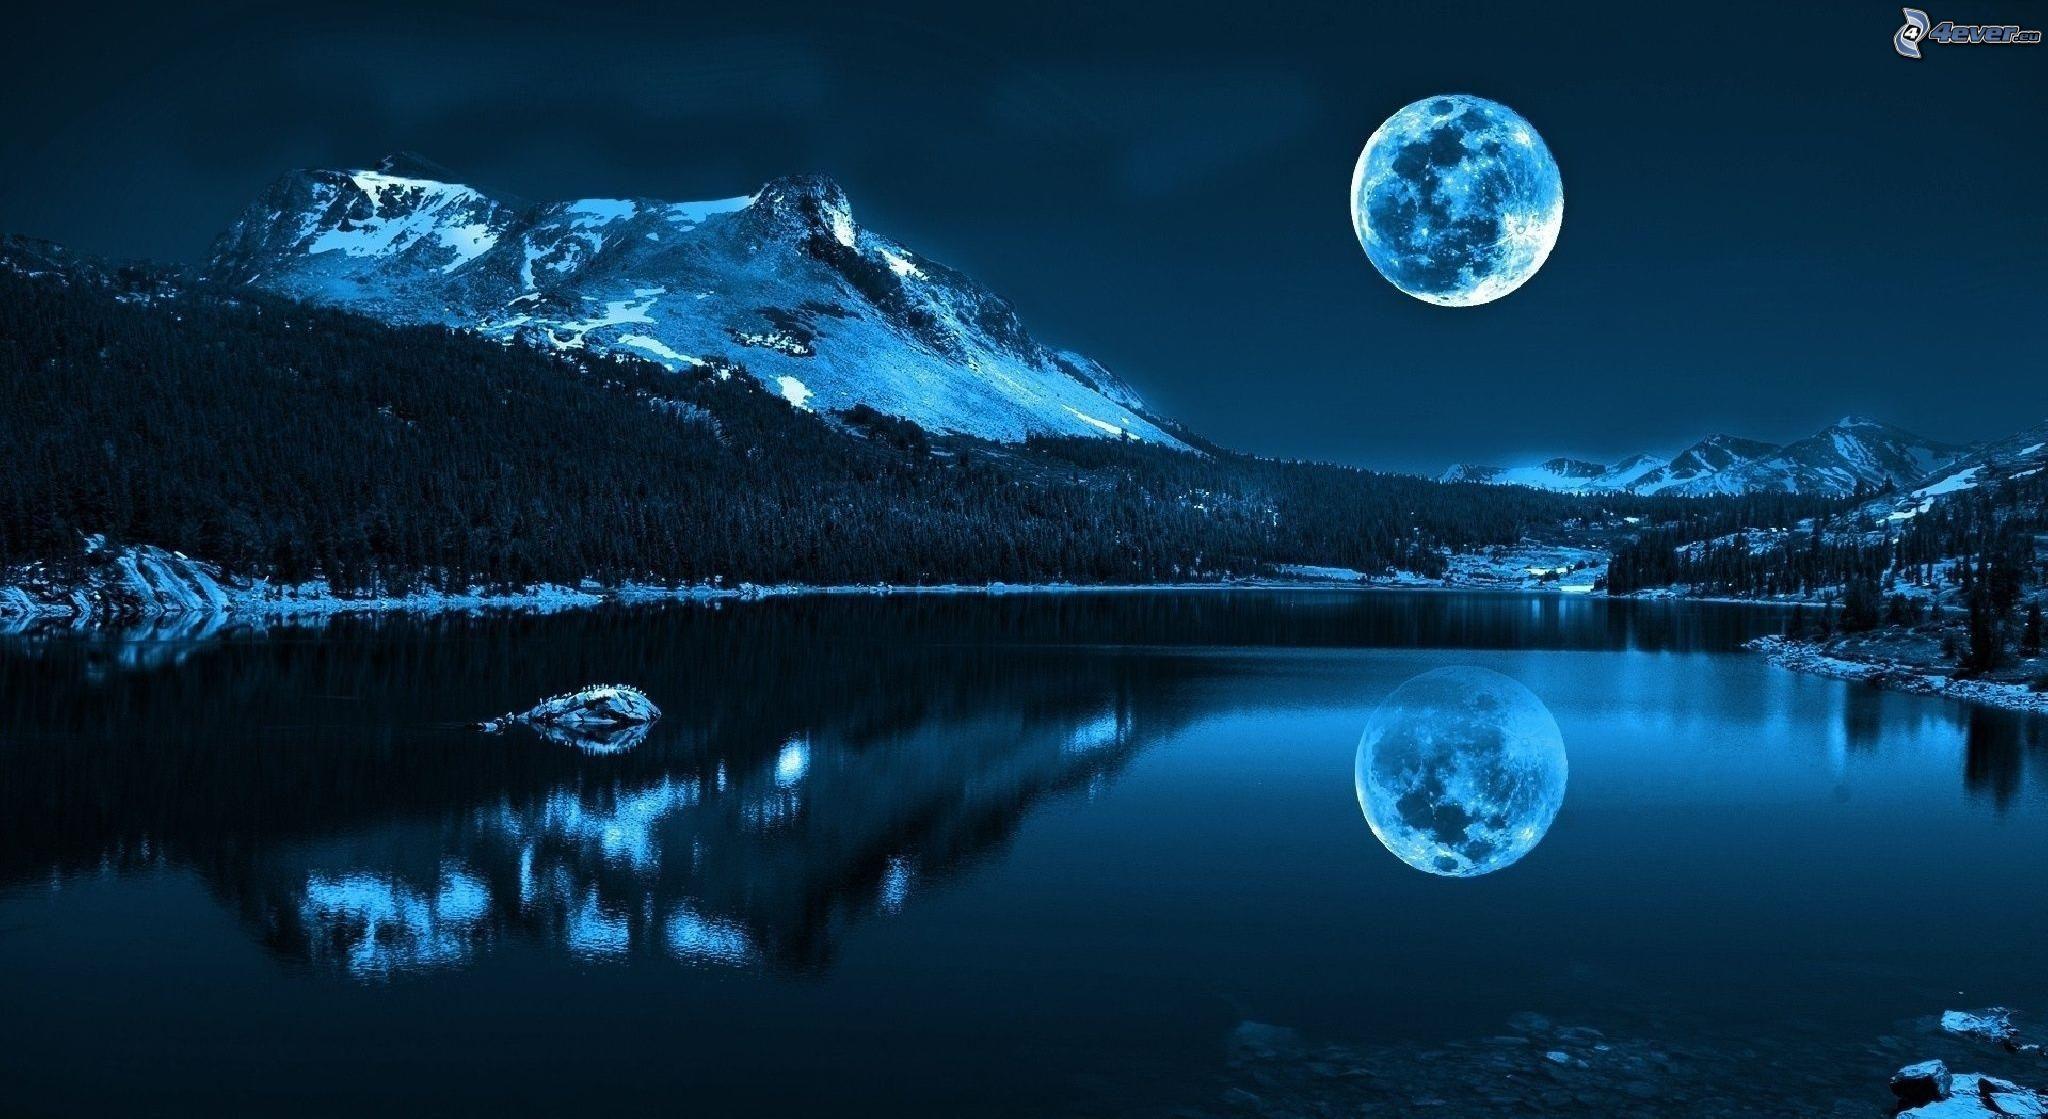 paesaggi notturni - Cerca con Google